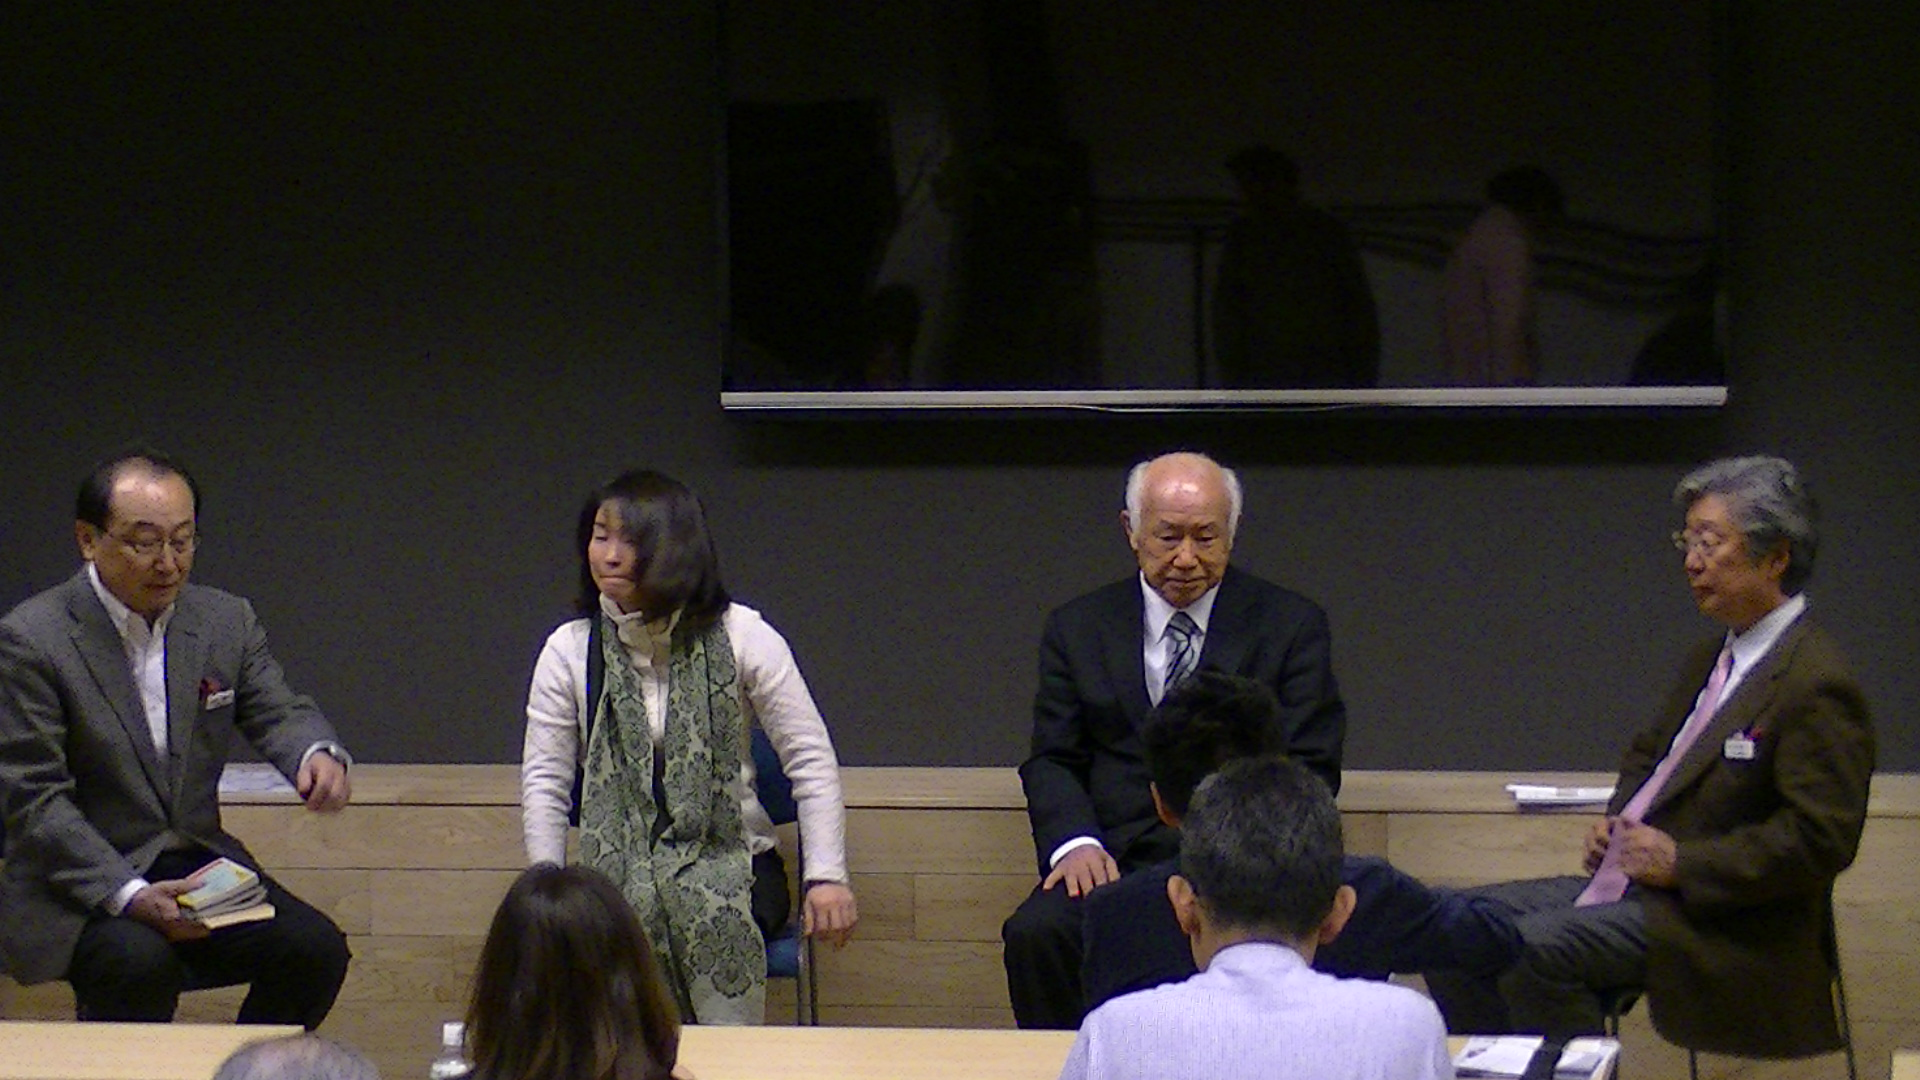 PIC 0540 - 4月1日東京思風塾の開催になります。